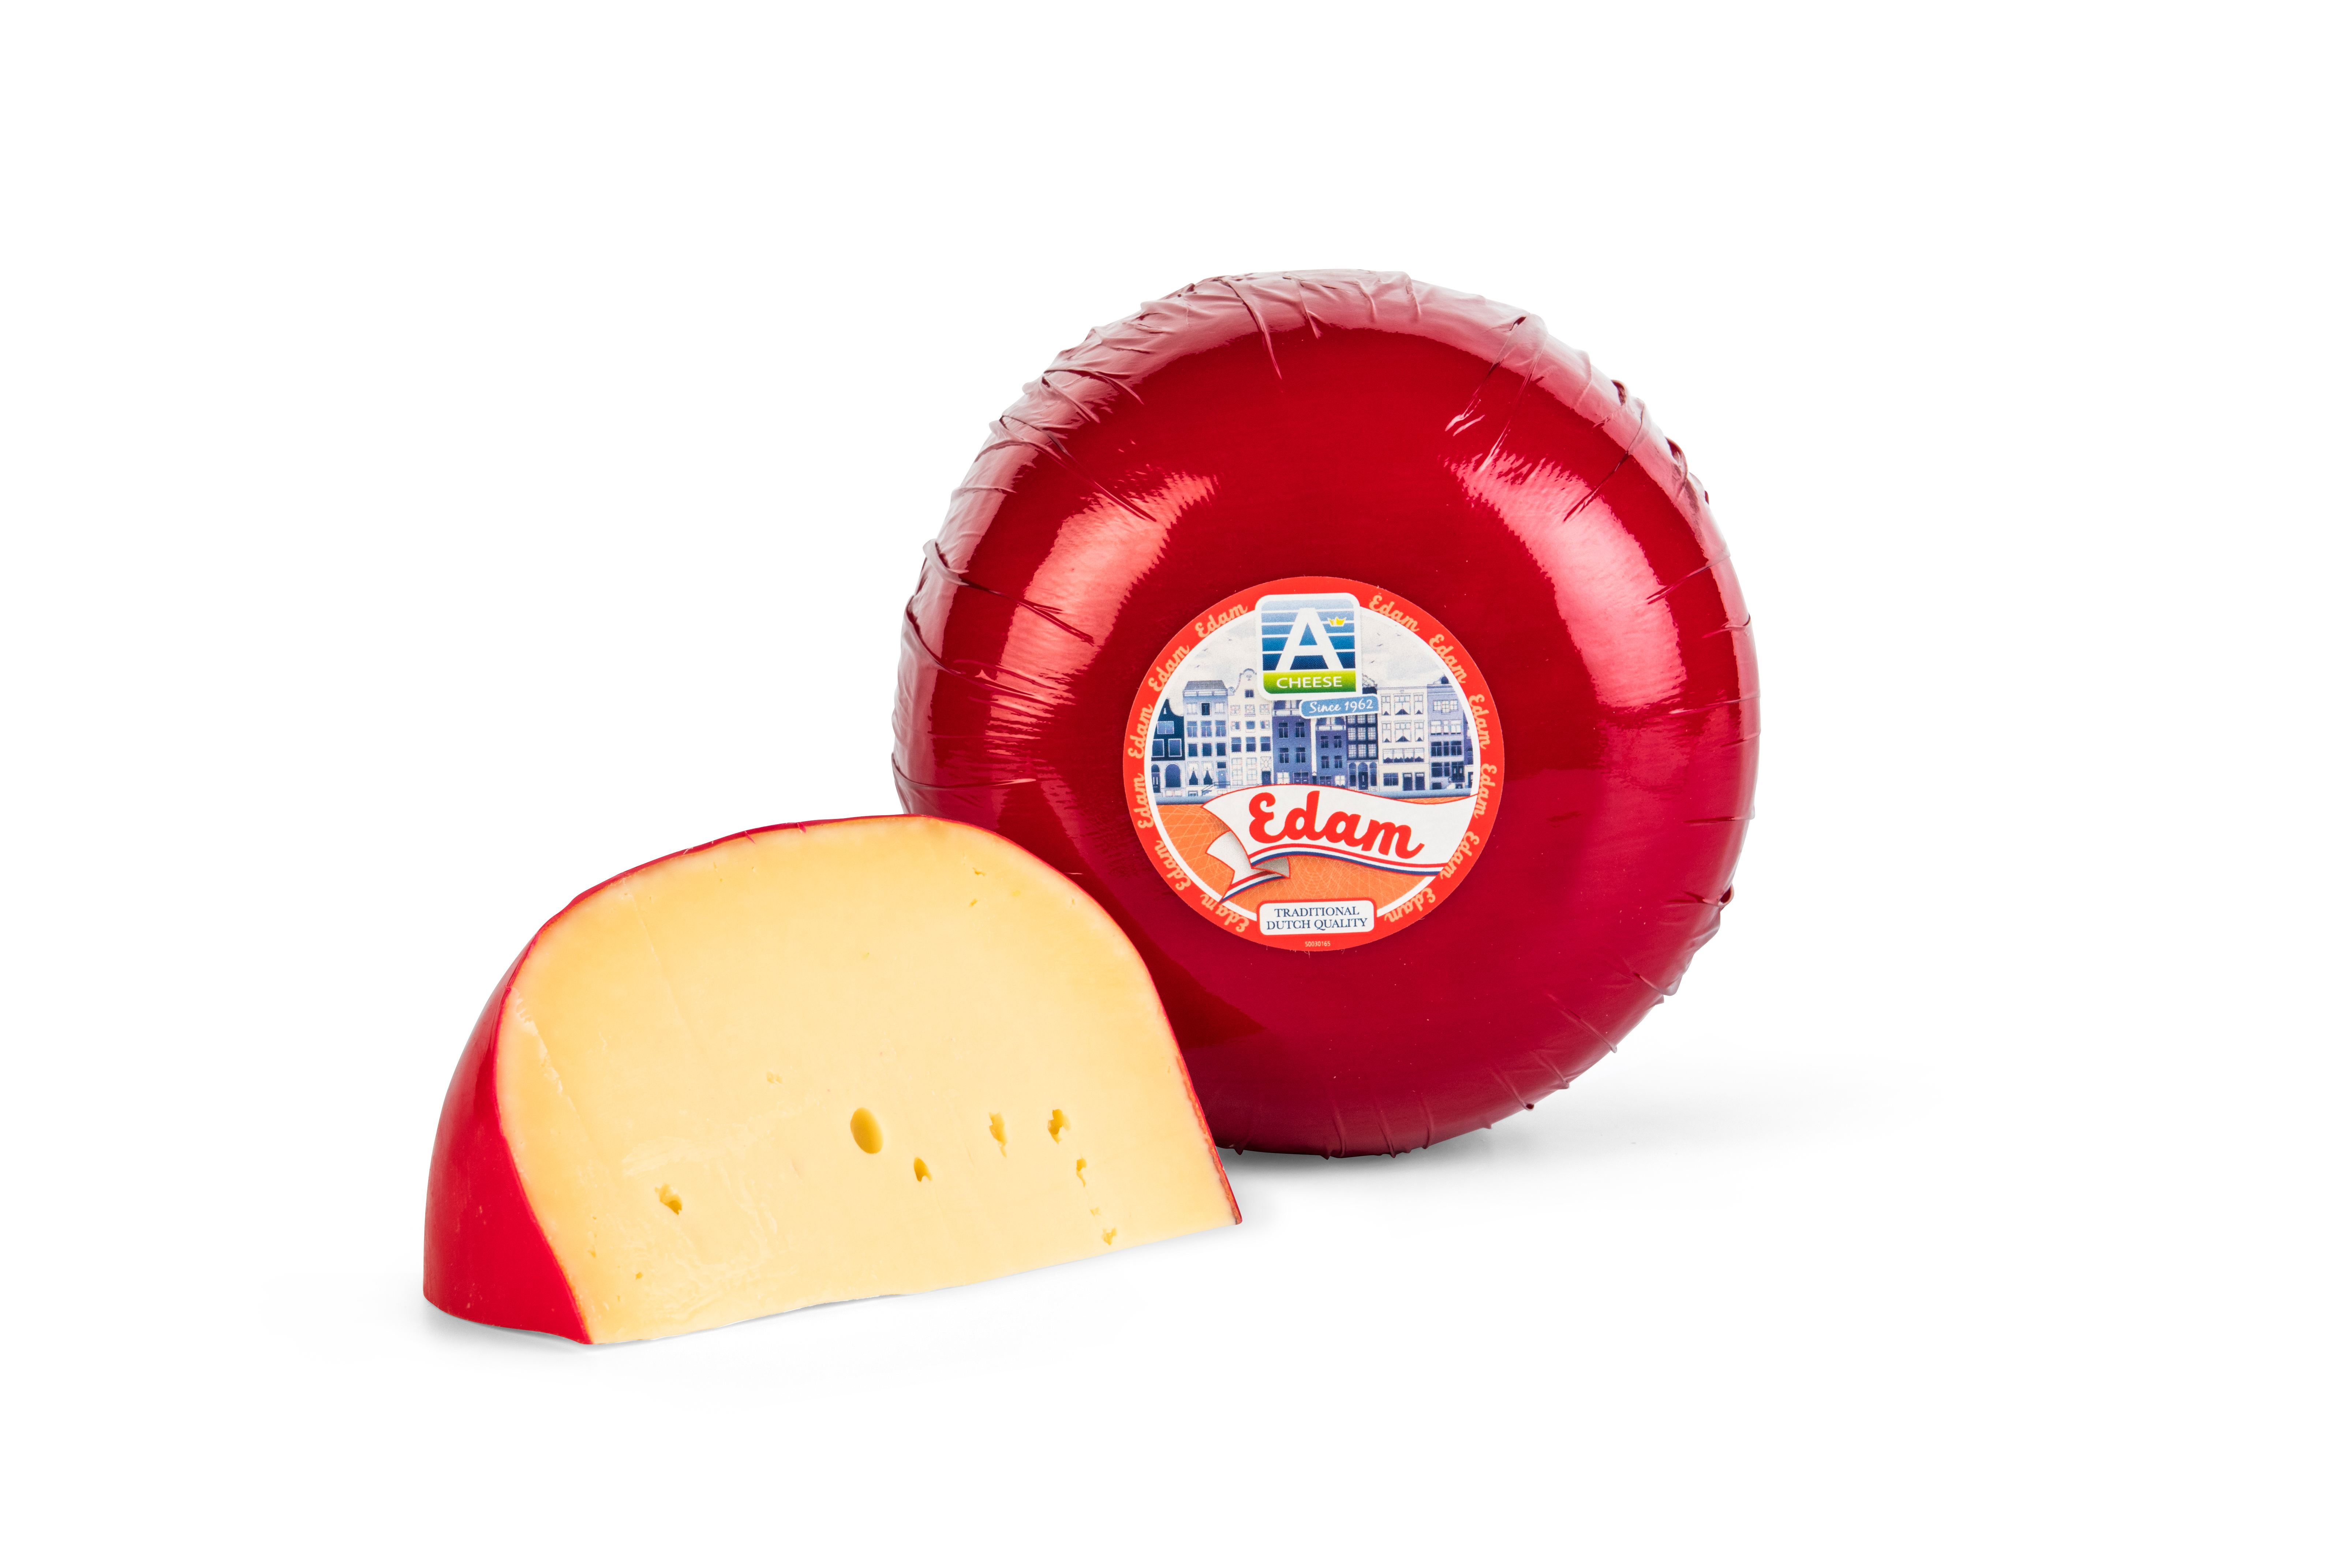 Edam Ball Holland 1 kg